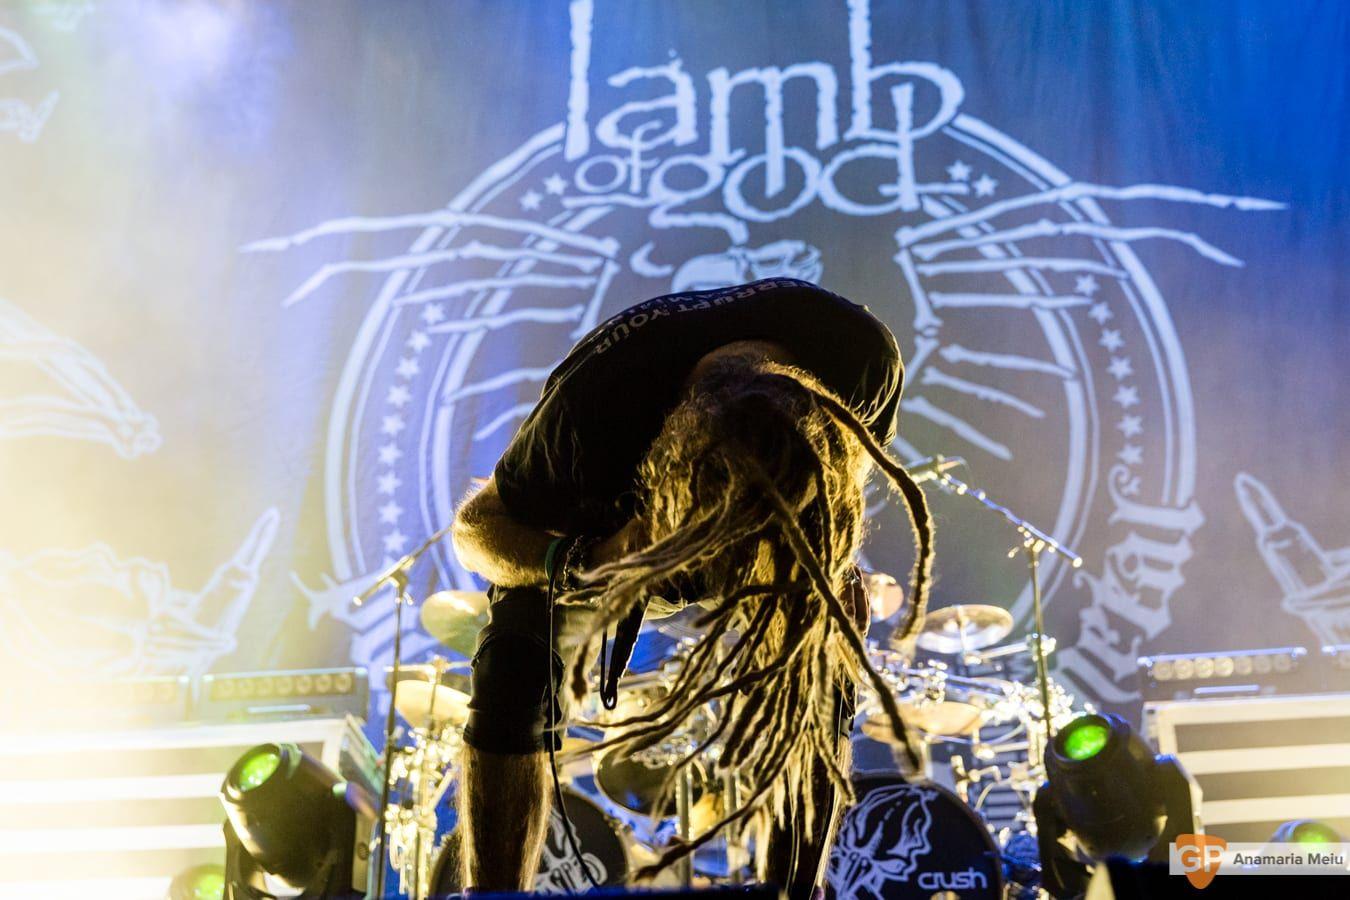 Lamb of God at 3Arena by Anamaria Meiu